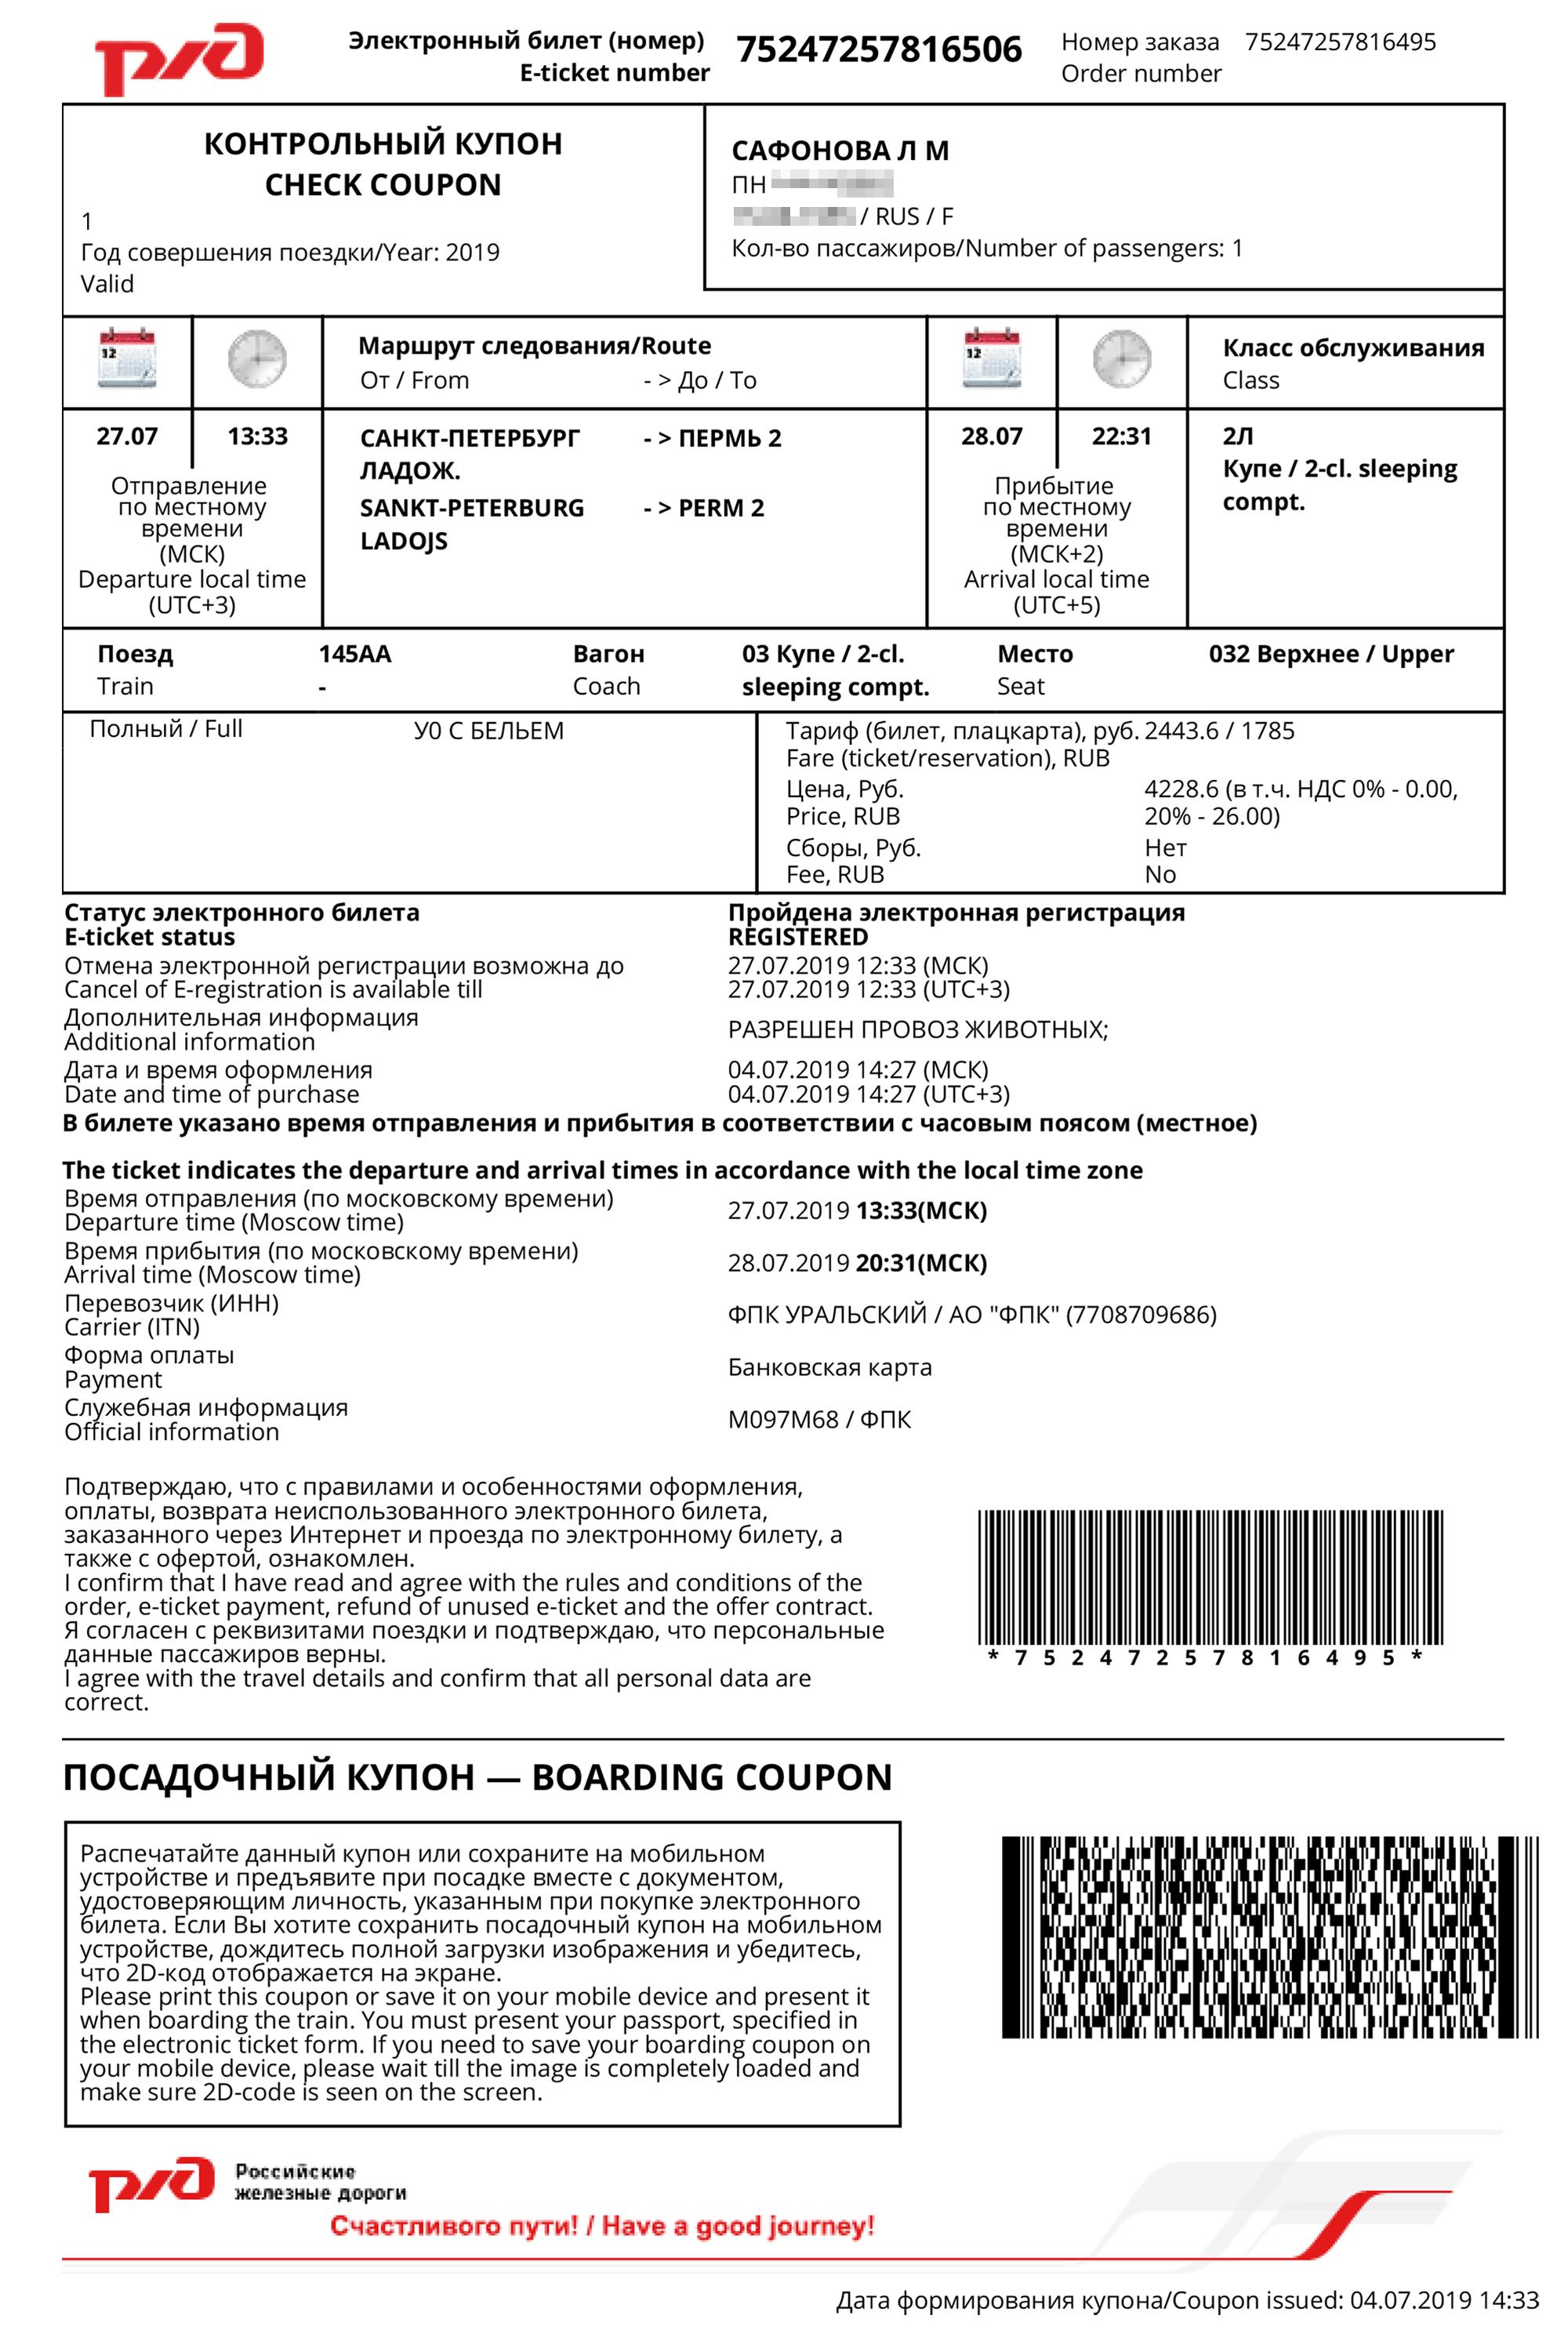 Билеты туда и&nbsp;обратно обошлись в&nbsp;9500&nbsp;<span class=ruble>Р</span> на&nbsp;человека